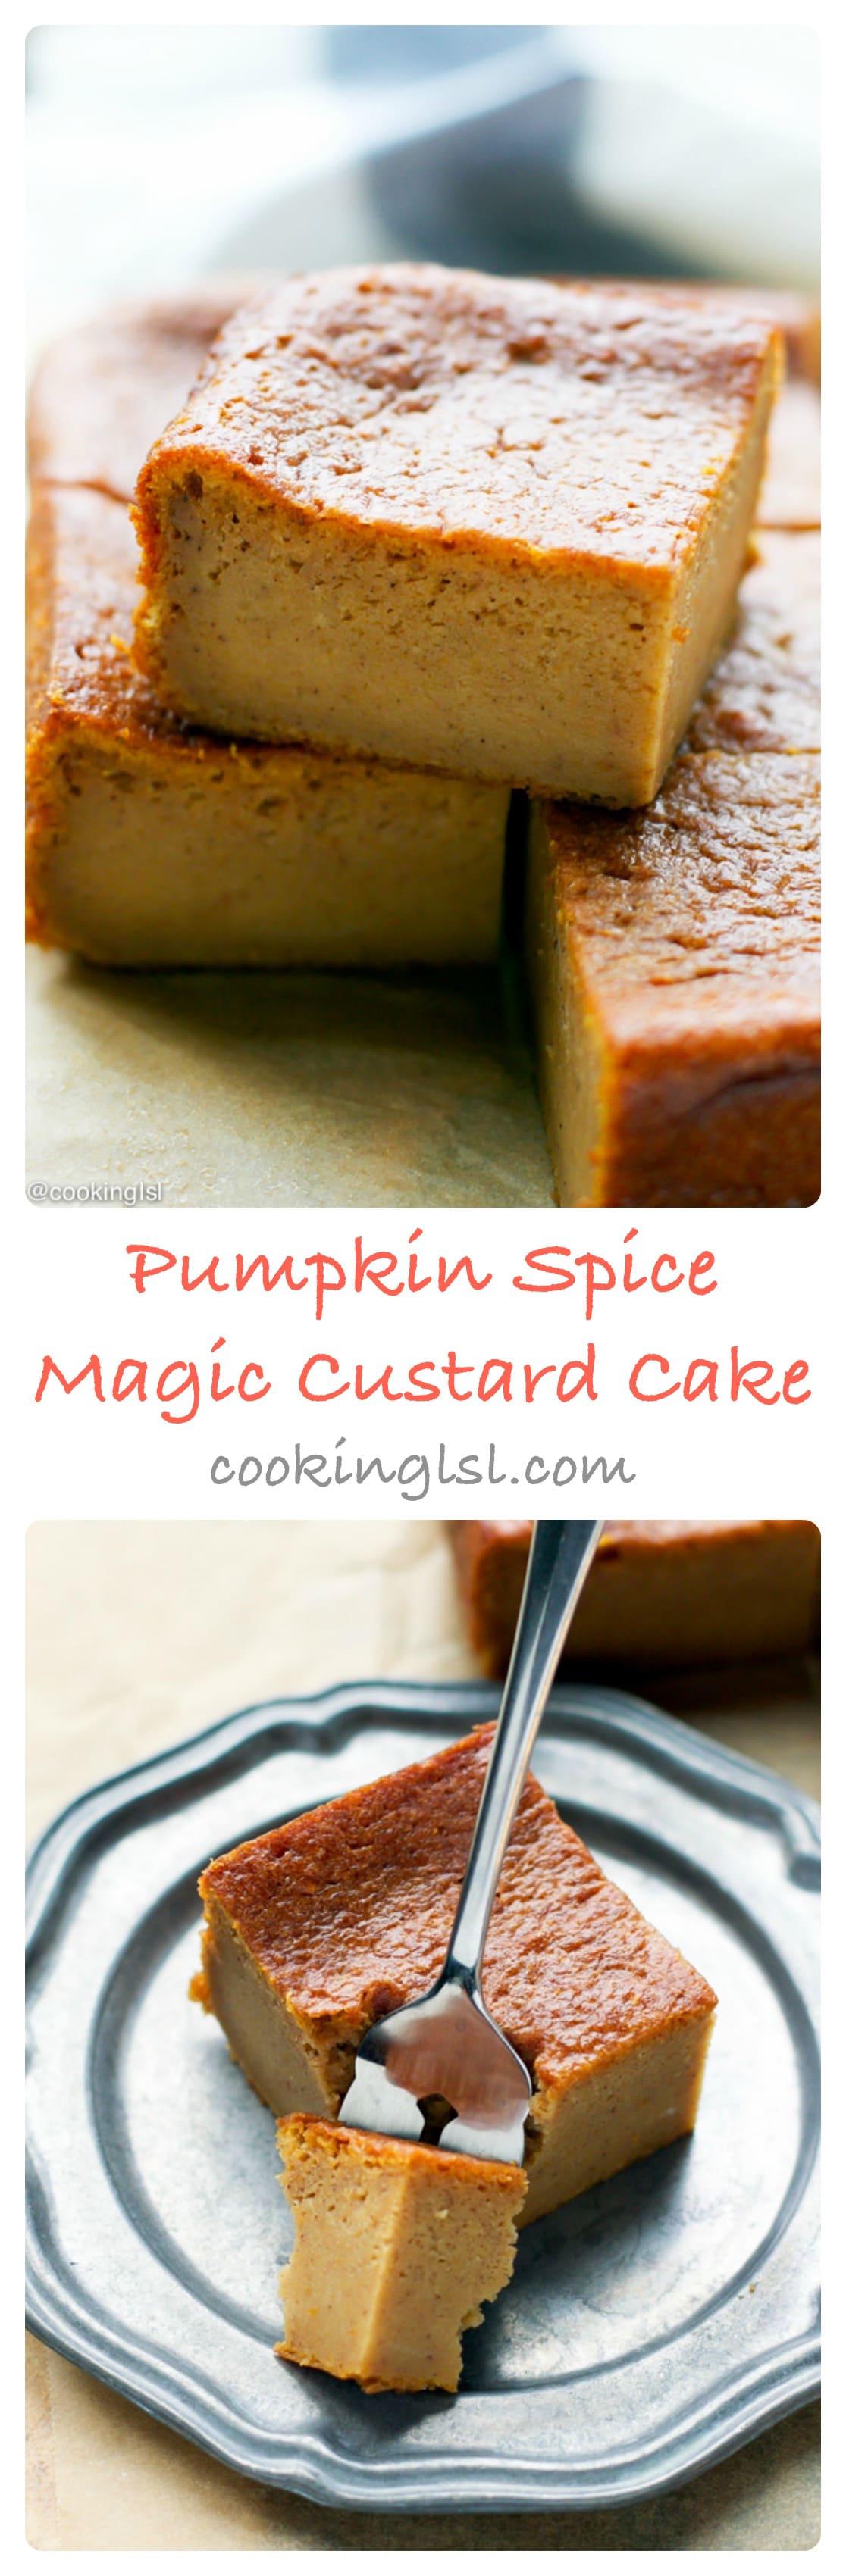 pumpkin-magic-custard-cake-recipe